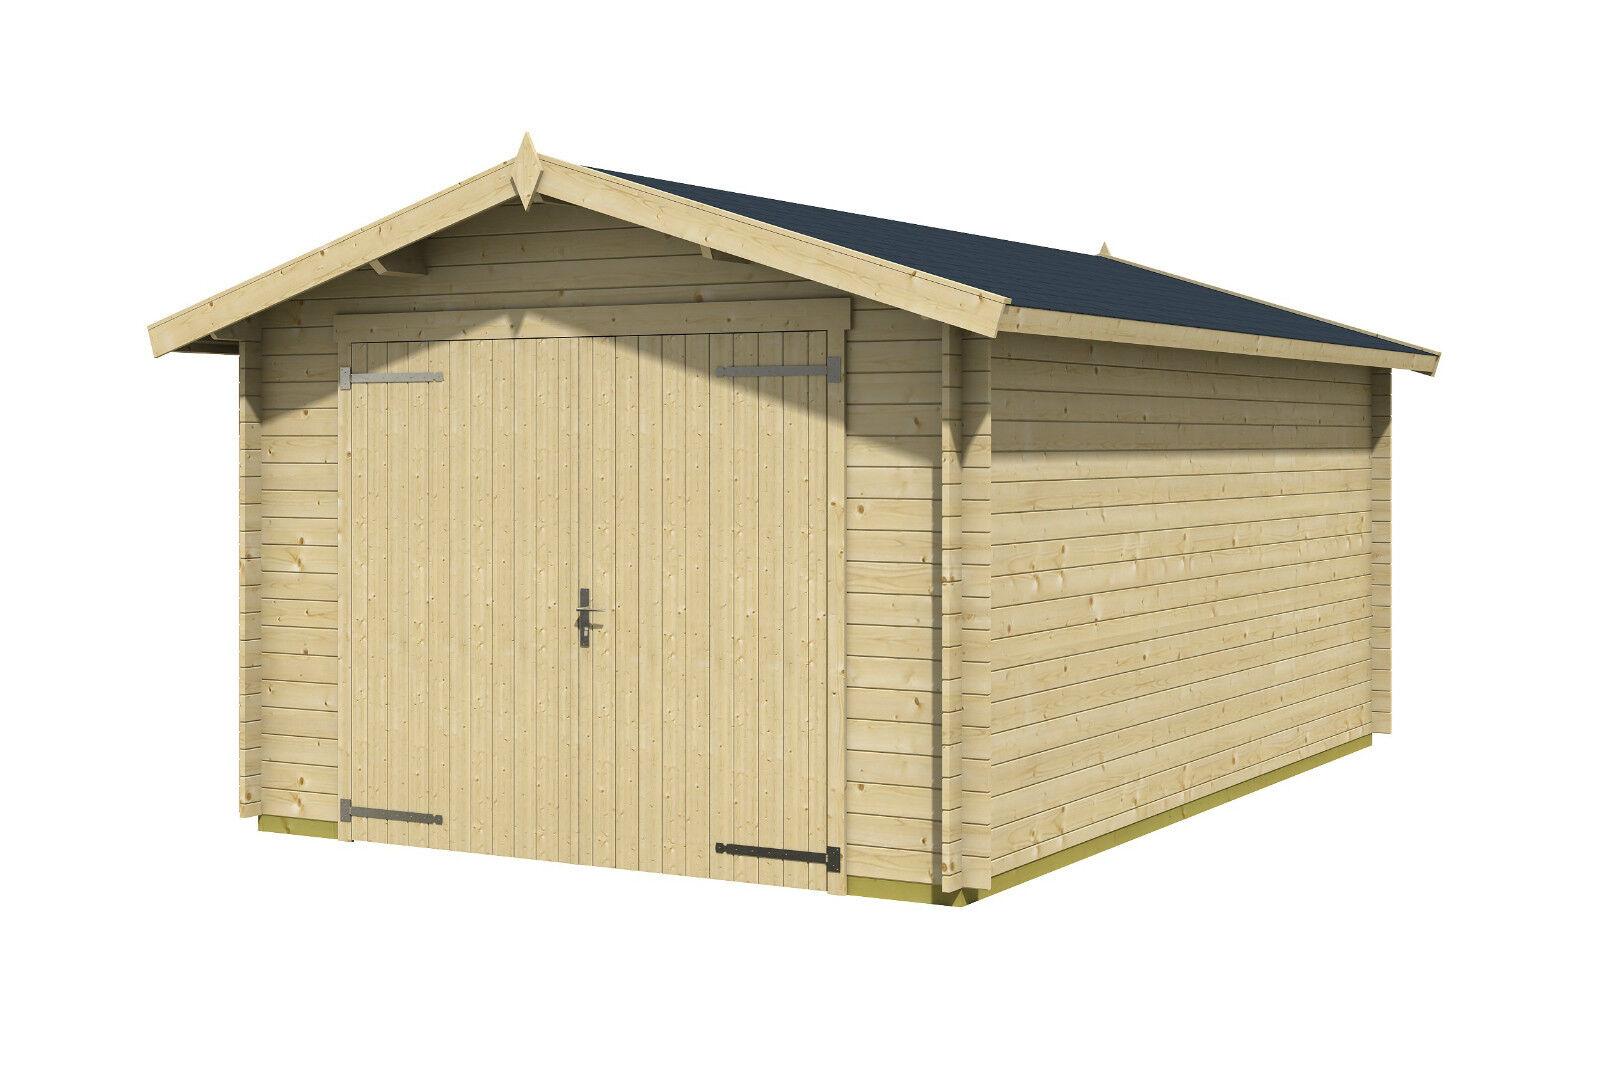 garage ca 350x530 cm gartenhaus ger tehaus blockhaus. Black Bedroom Furniture Sets. Home Design Ideas